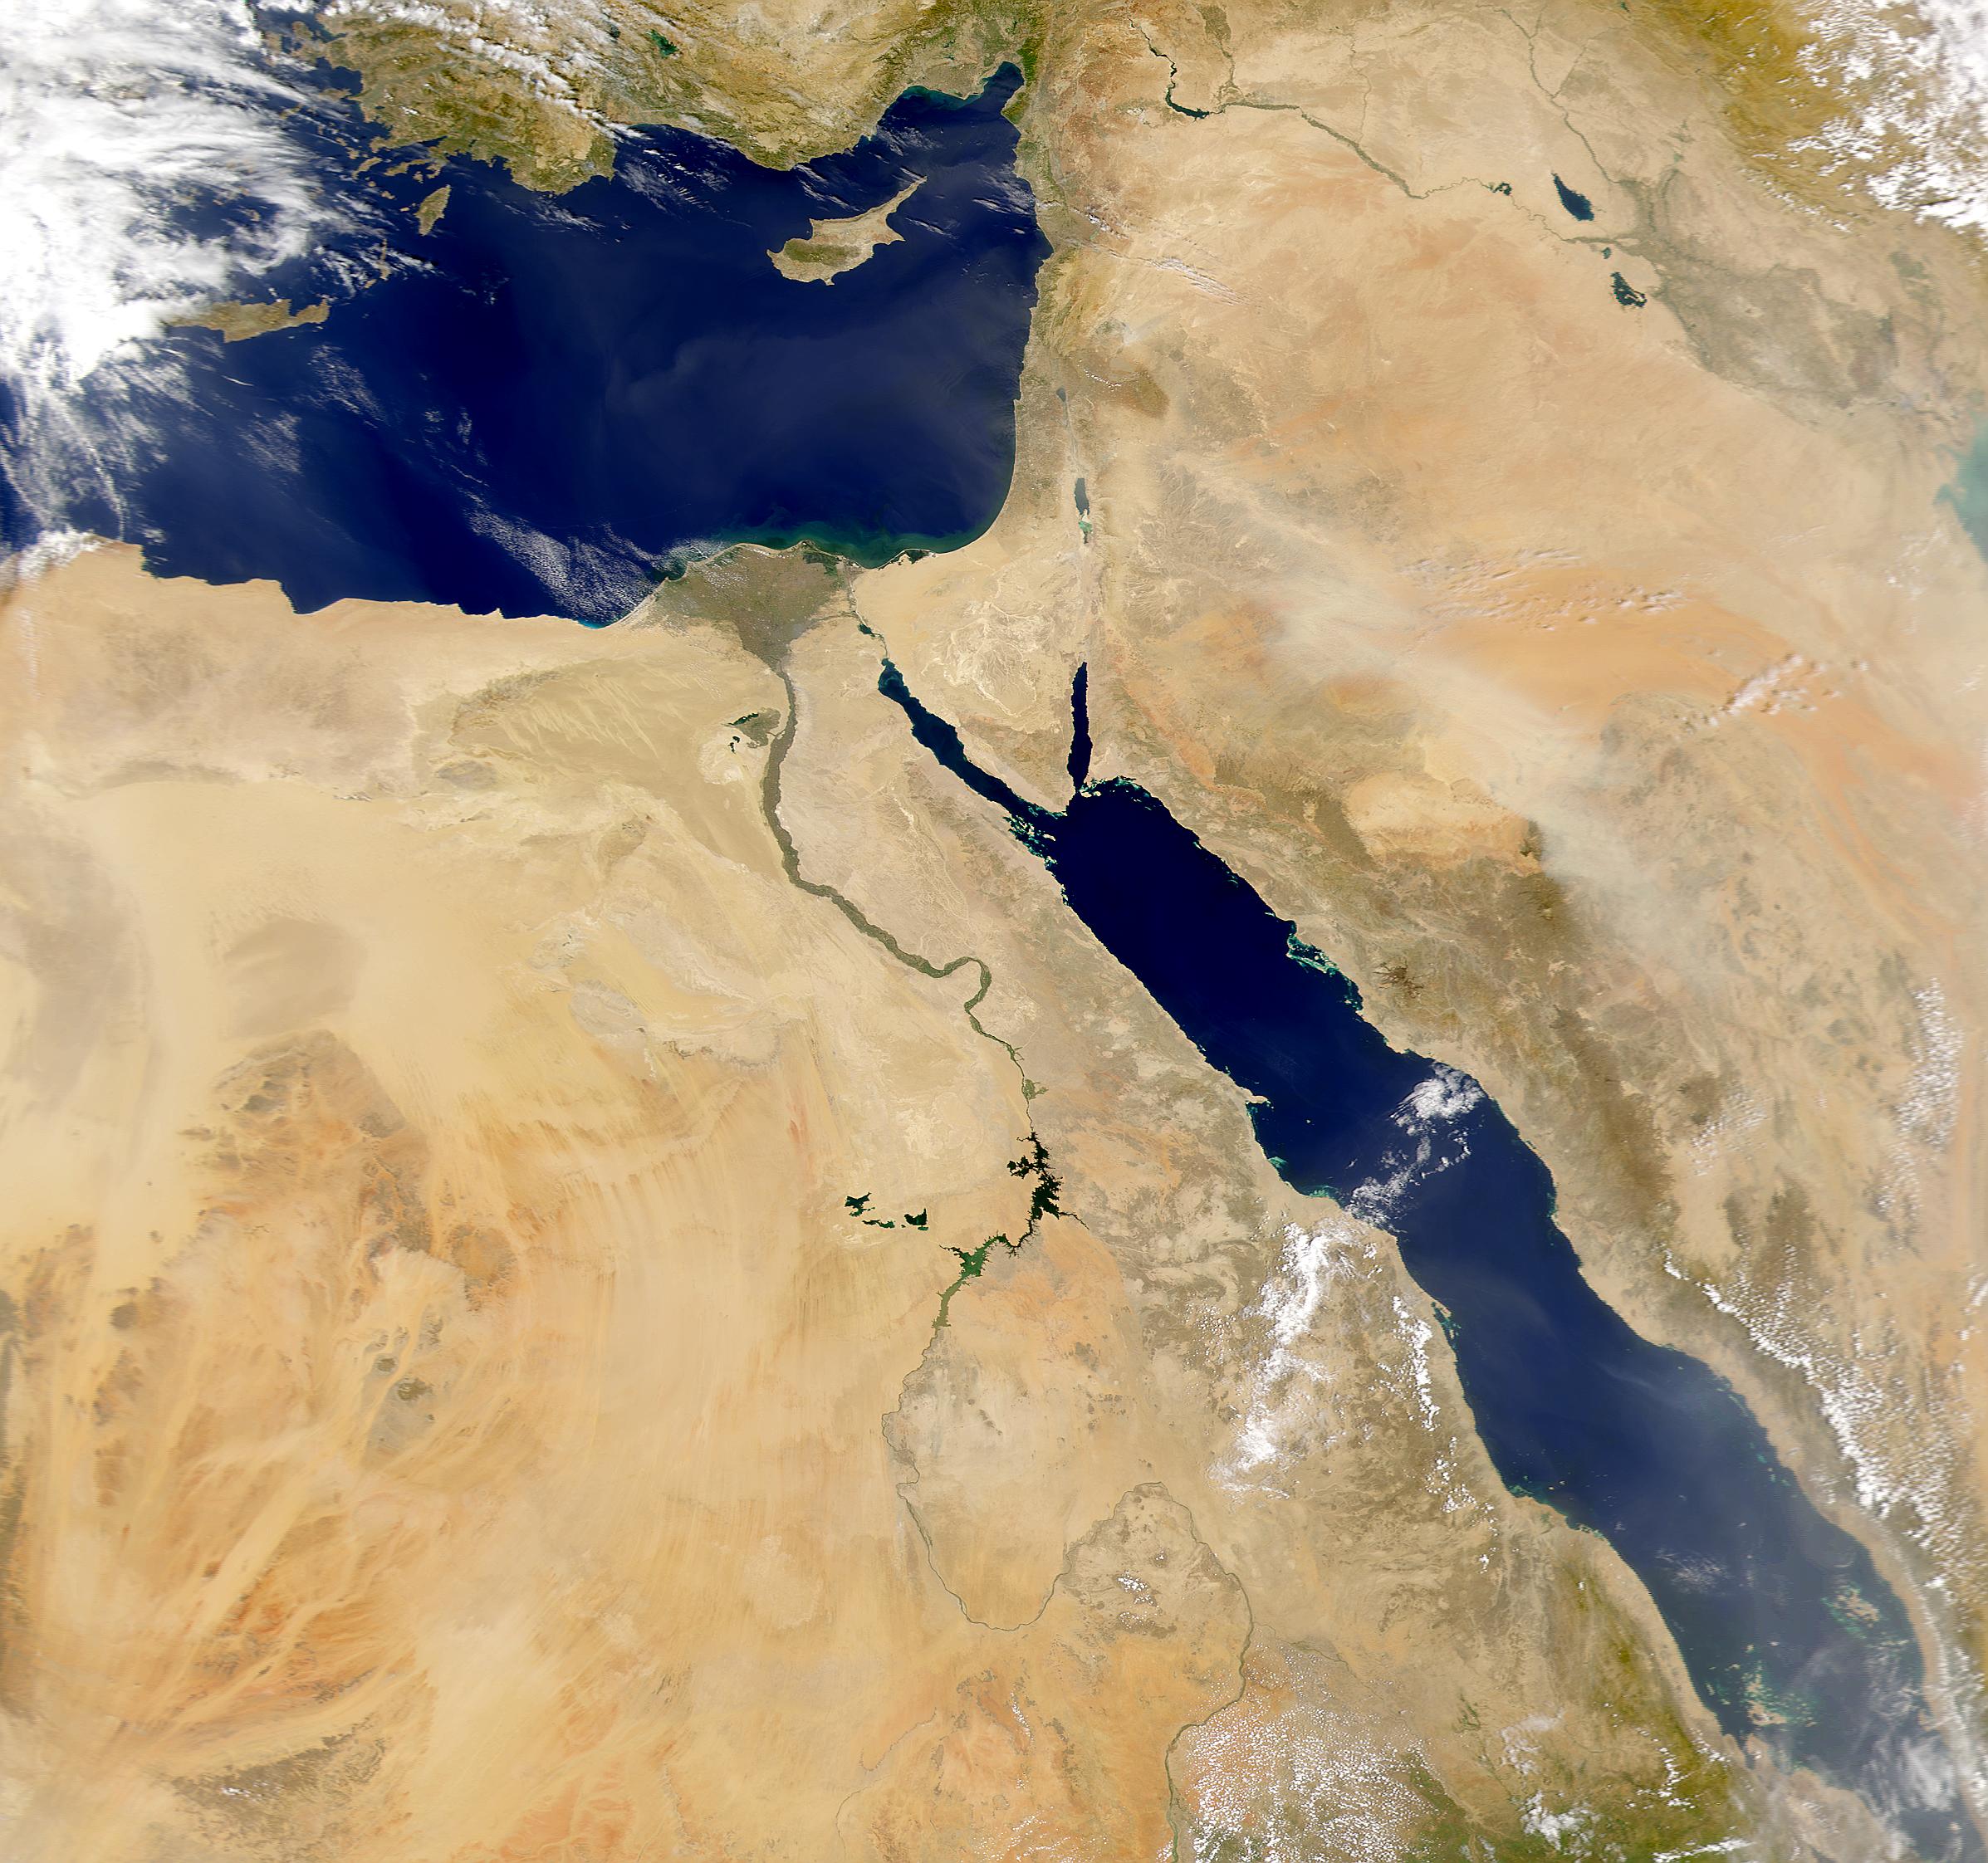 Río Nilo y tormenta de polvareda en Arabia Saudita